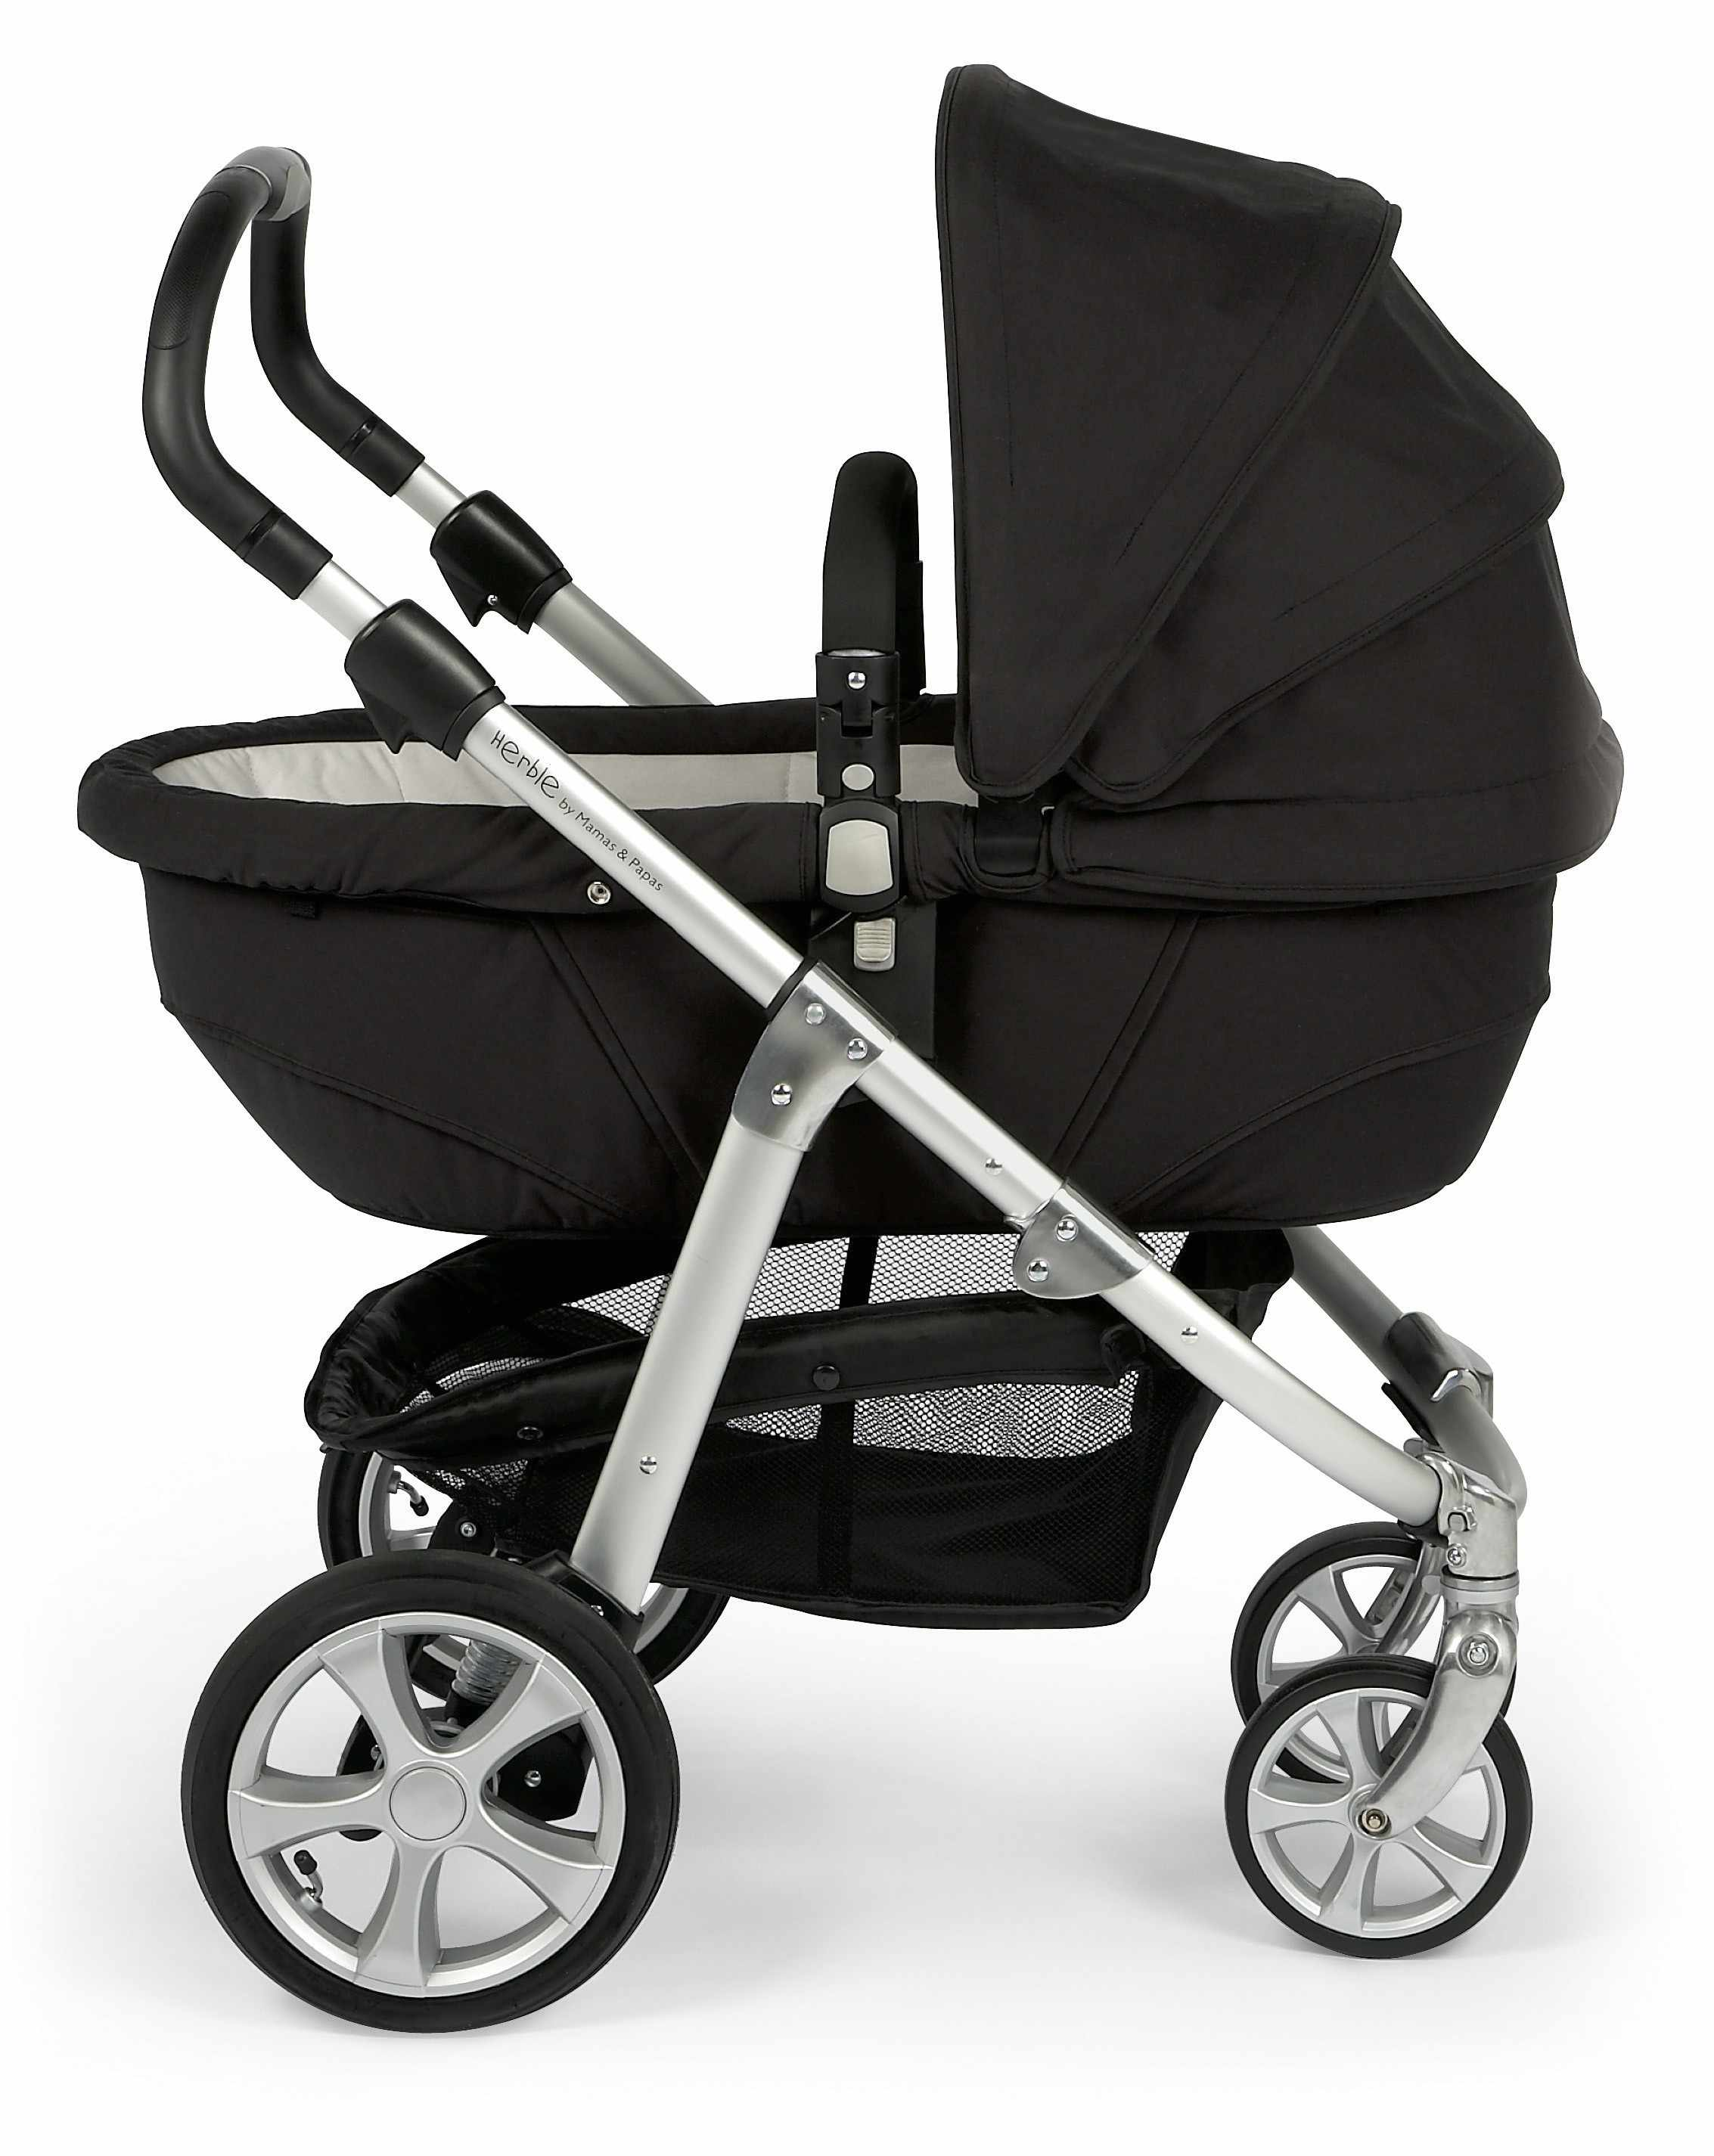 mamas-and-papas-ziko-herbie-travel-system-discontinued_3665